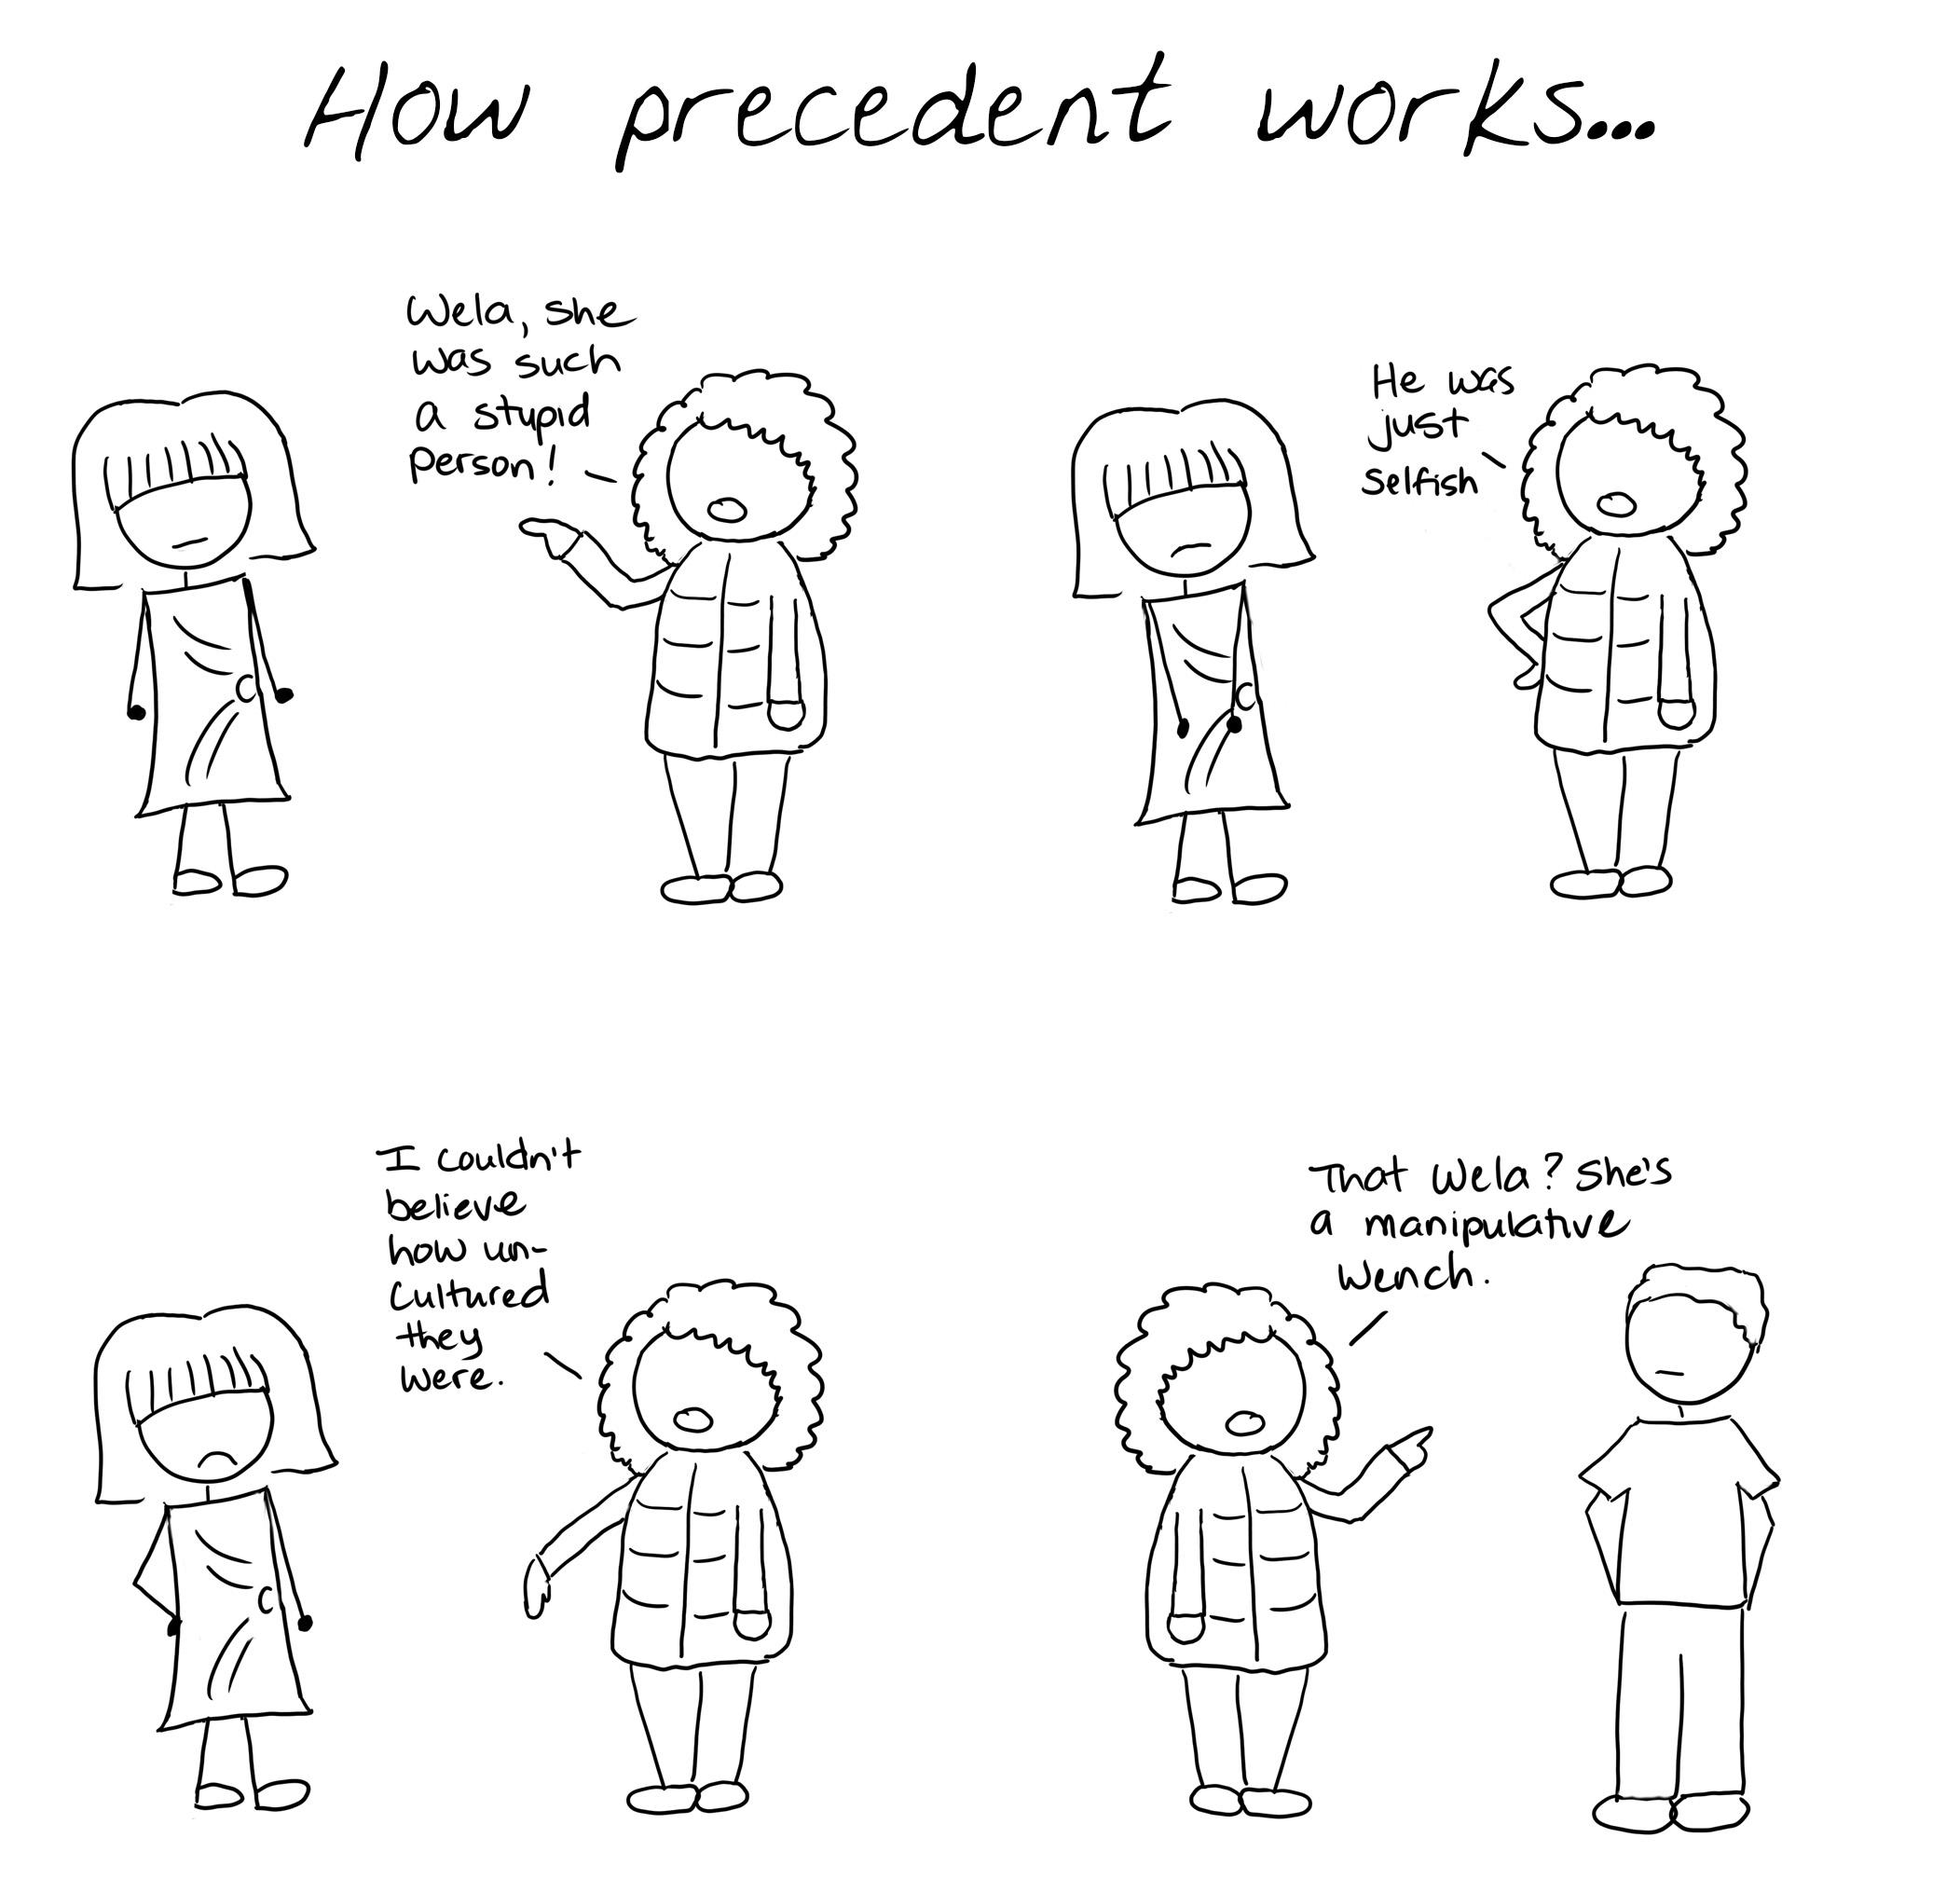 067 - Precedent